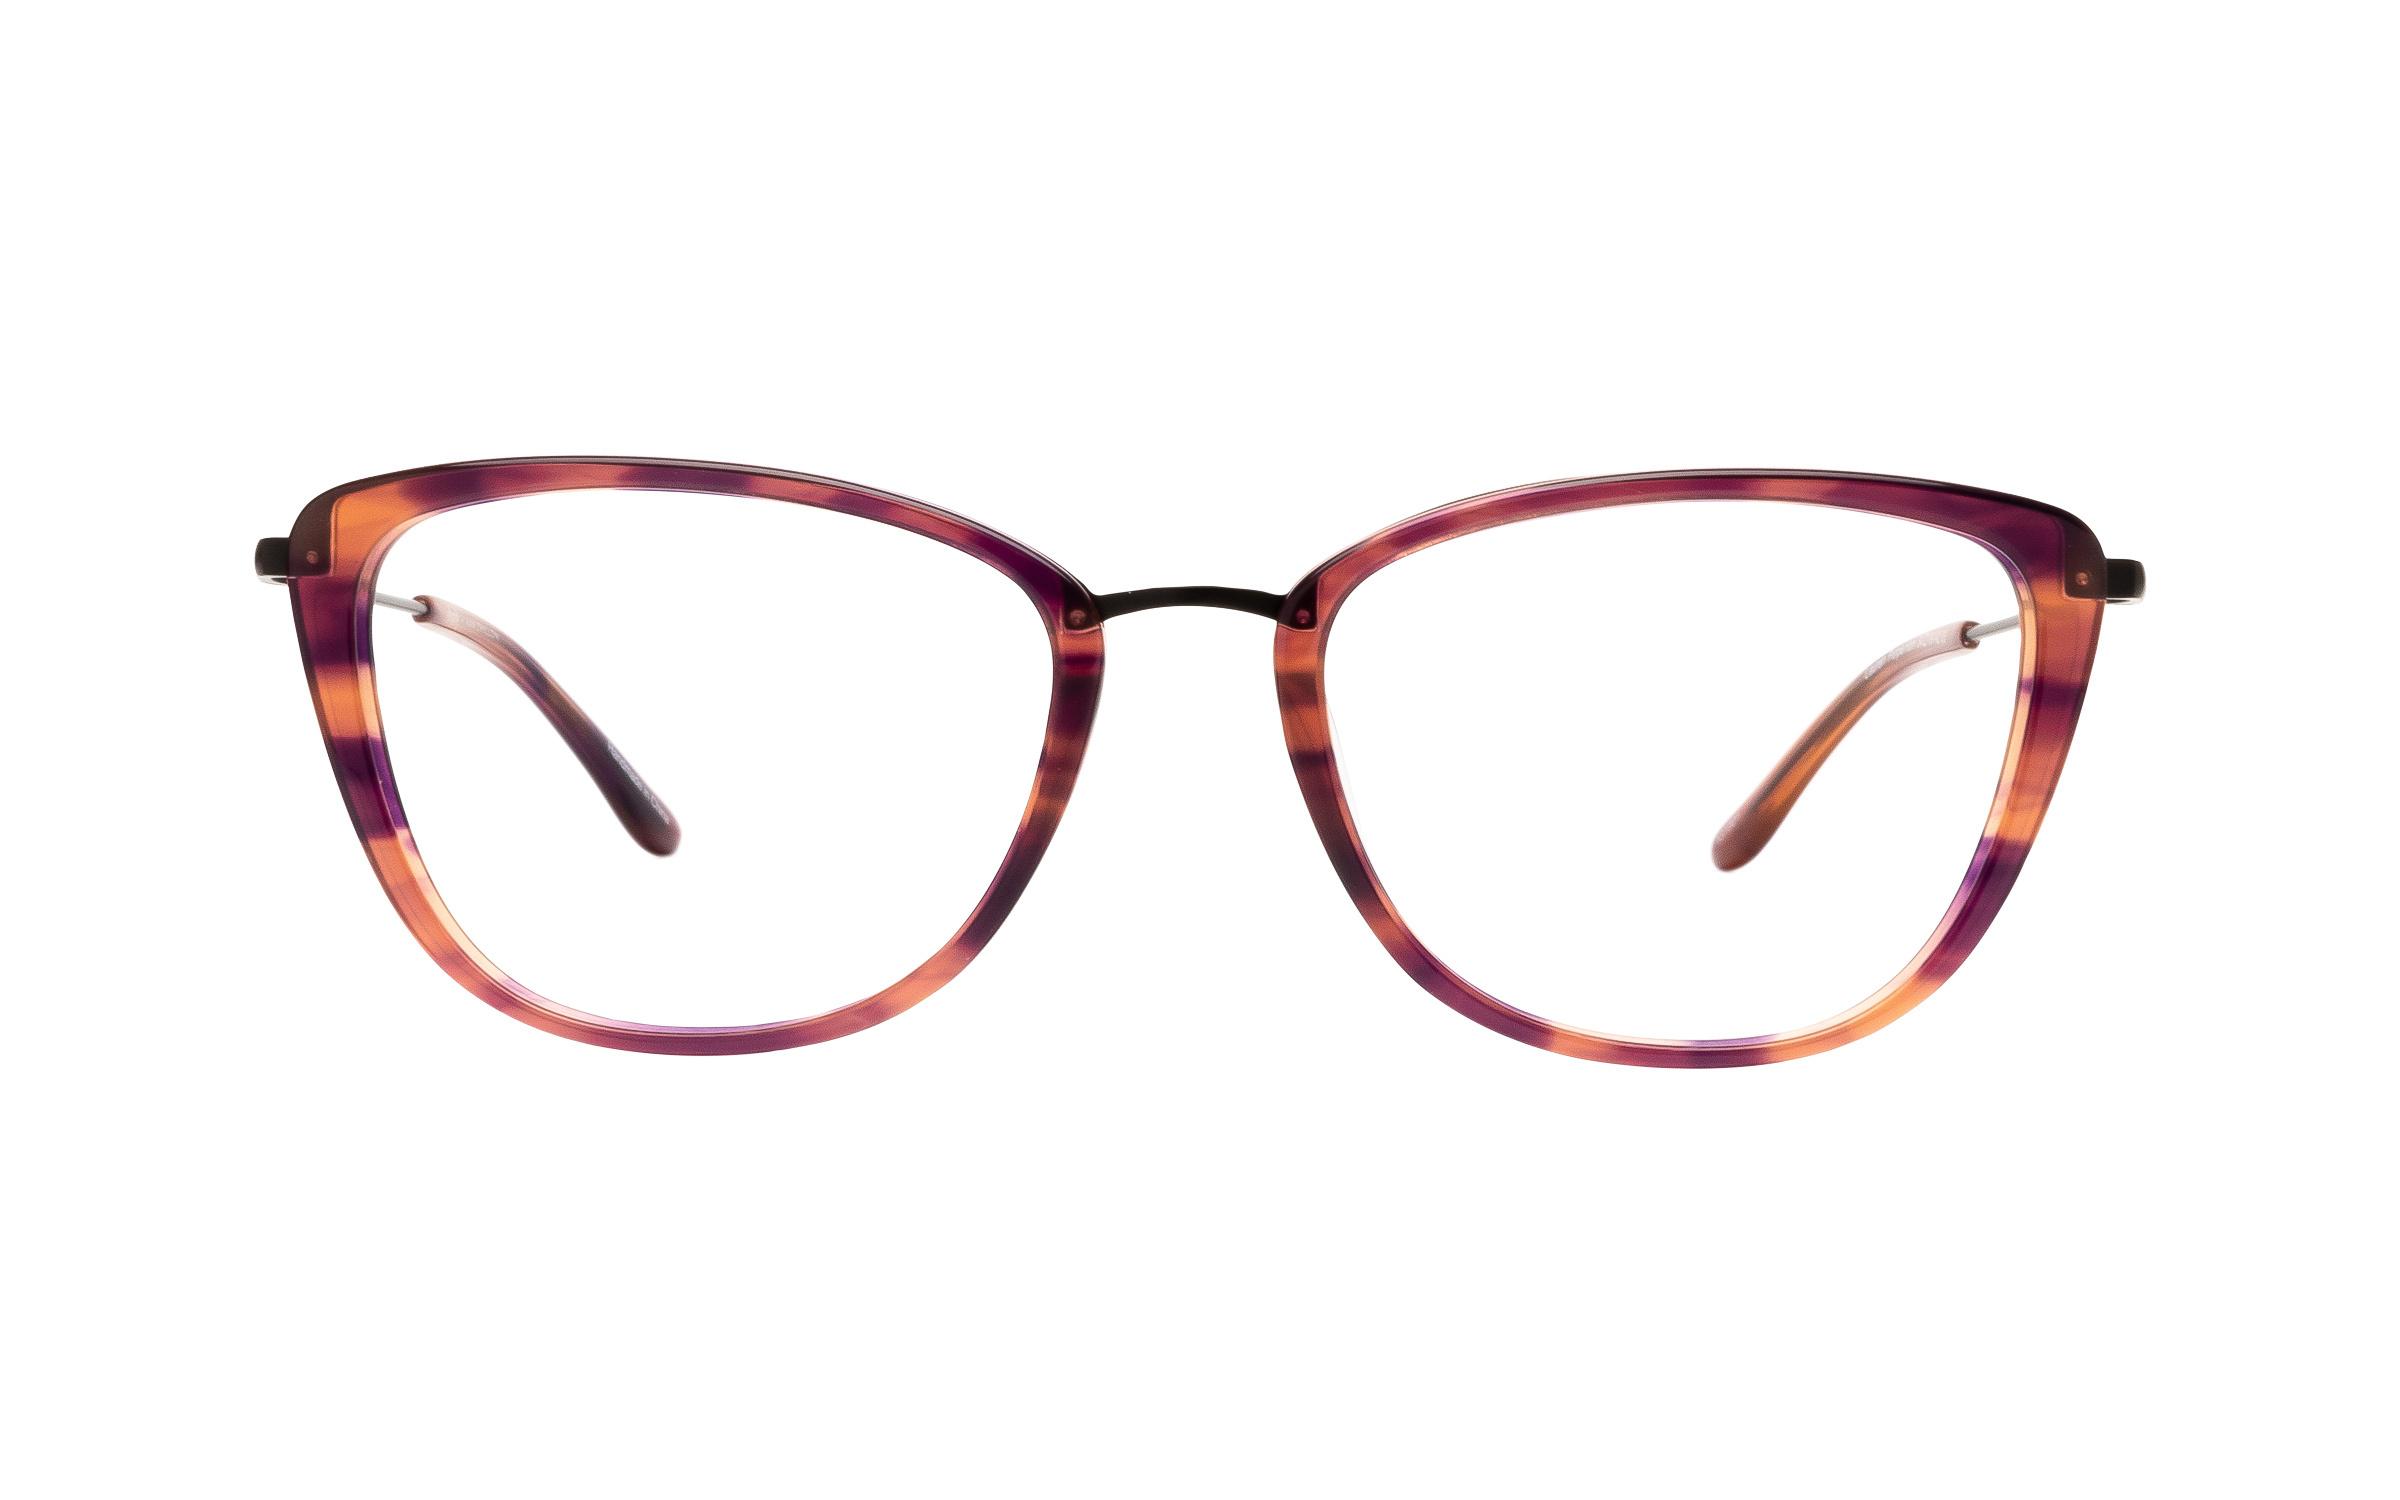 Kam Dhillon Lauren (54) Eyeglasses and Frame in Horn Purple | Acetate/Metal - Online Coastal